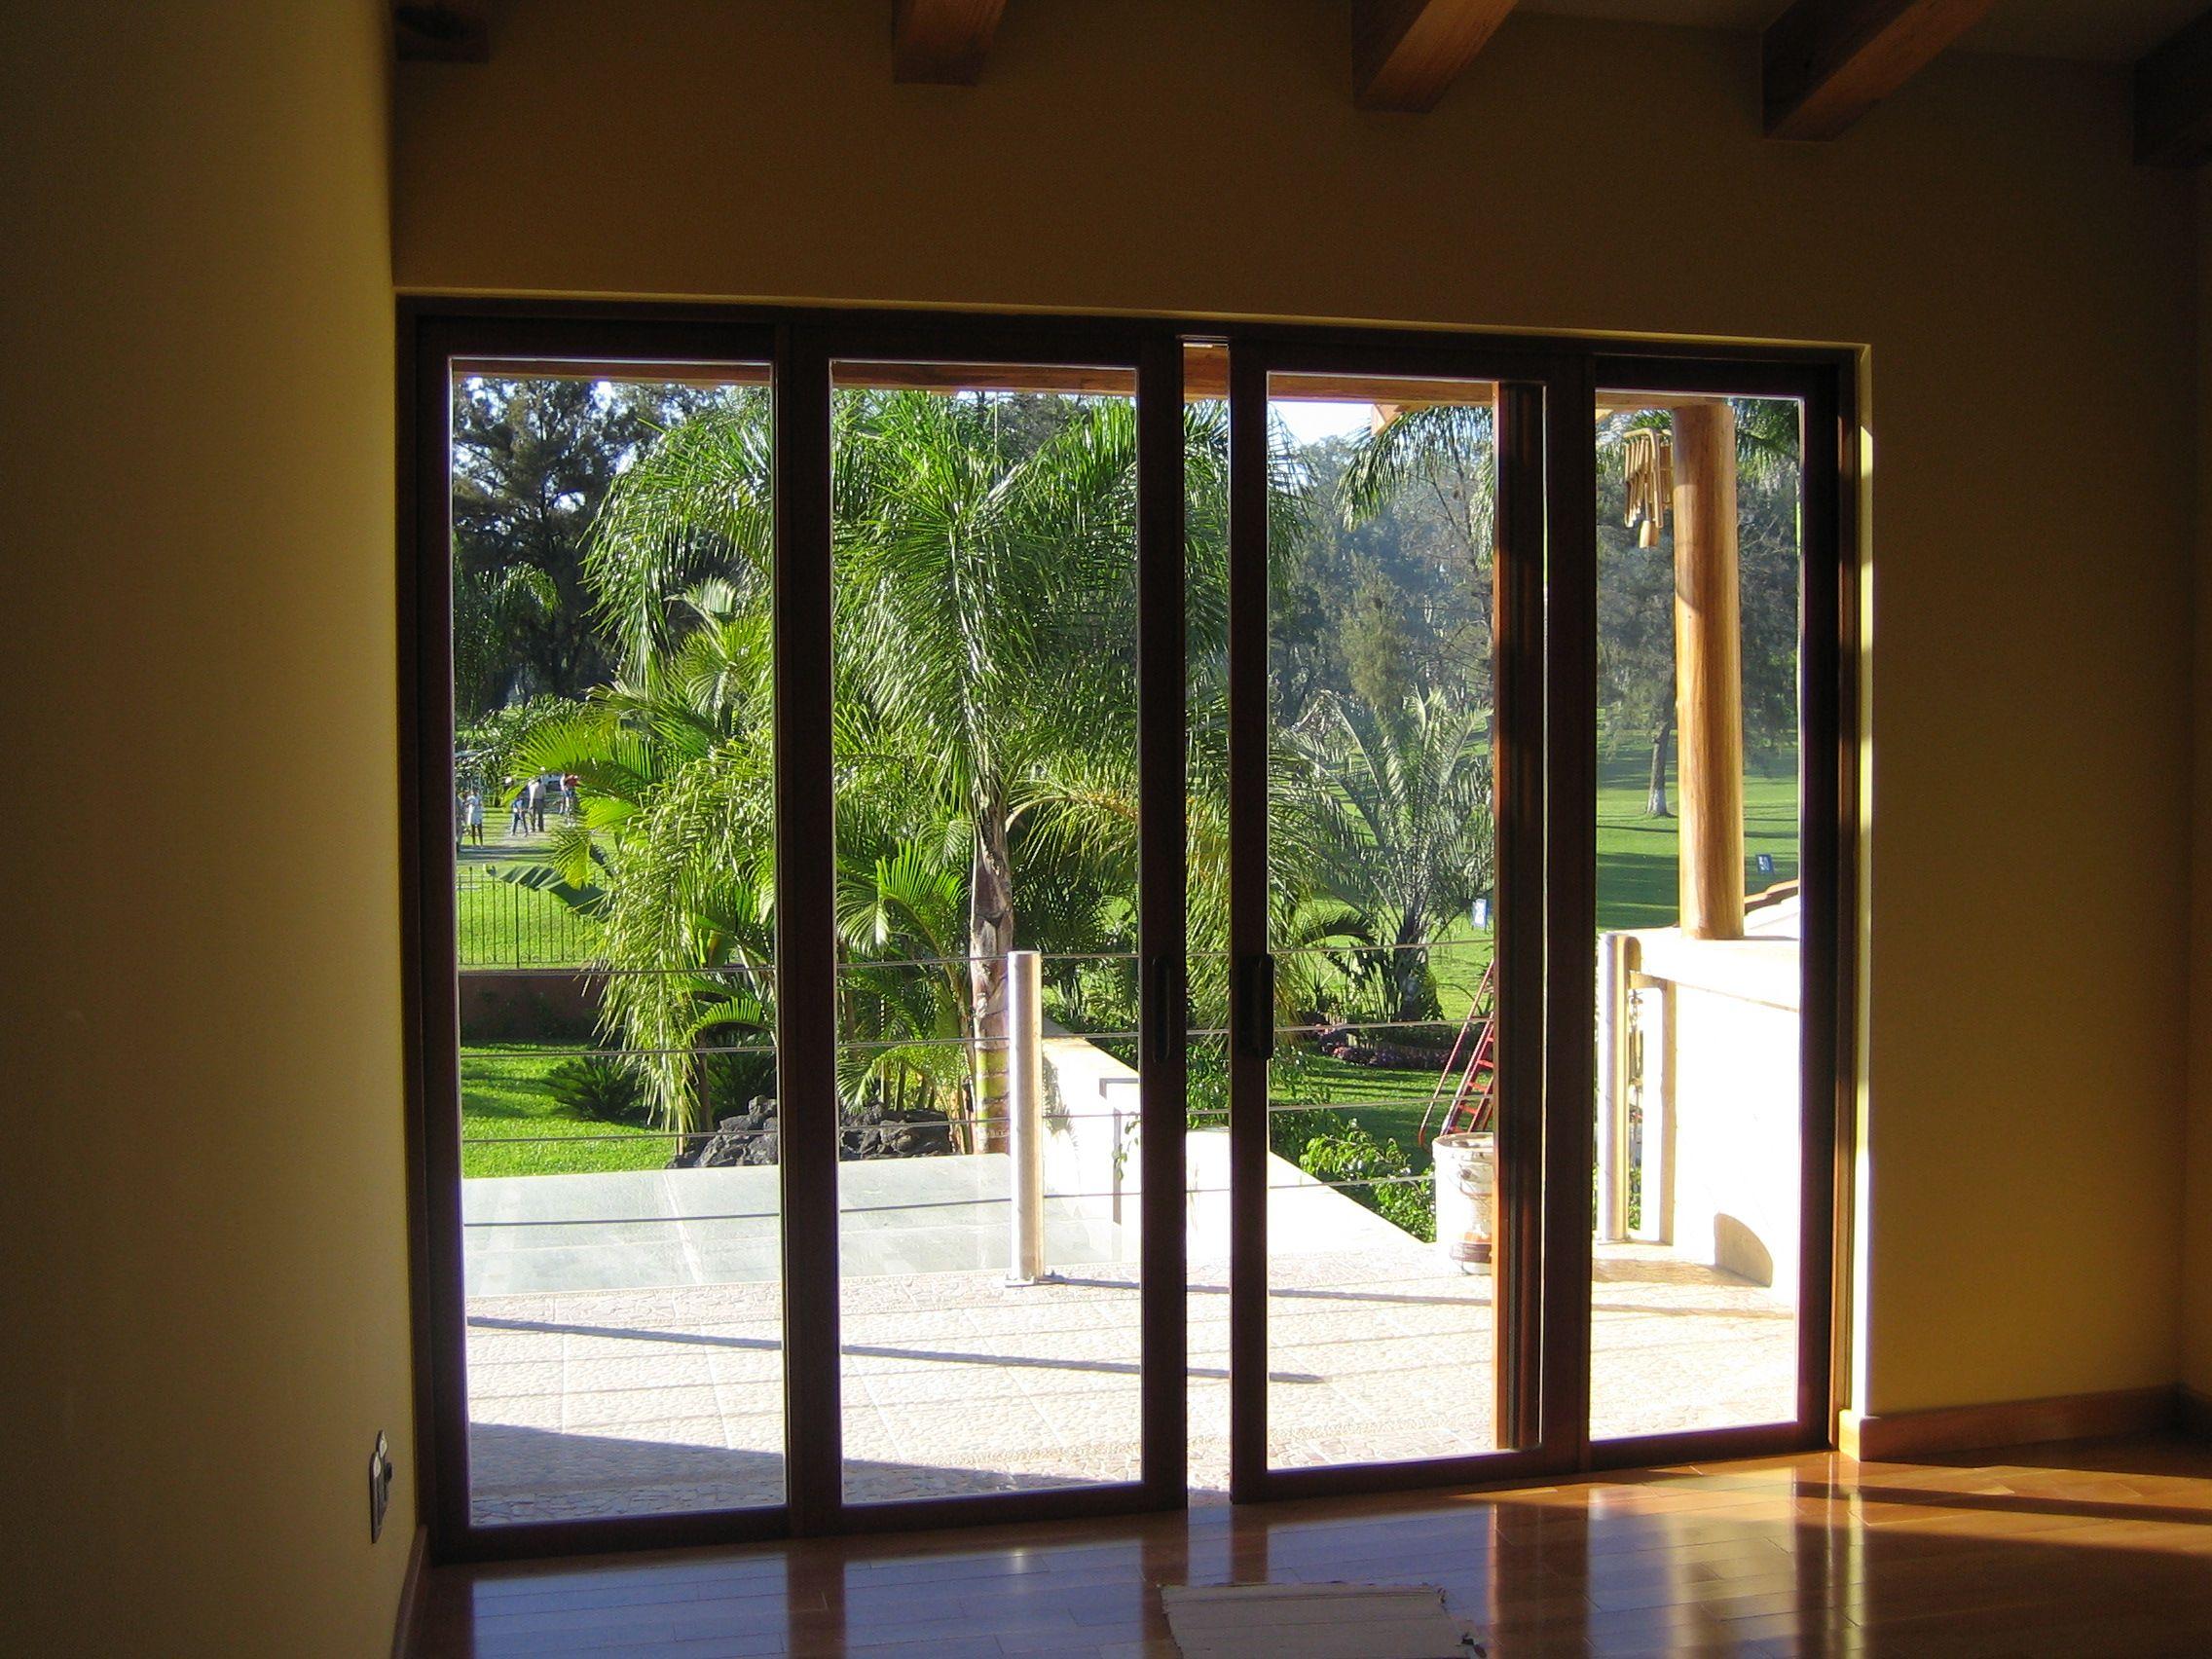 Puertas corredizas de madera ventana ventanademadera for Puerta ventana corrediza aluminio